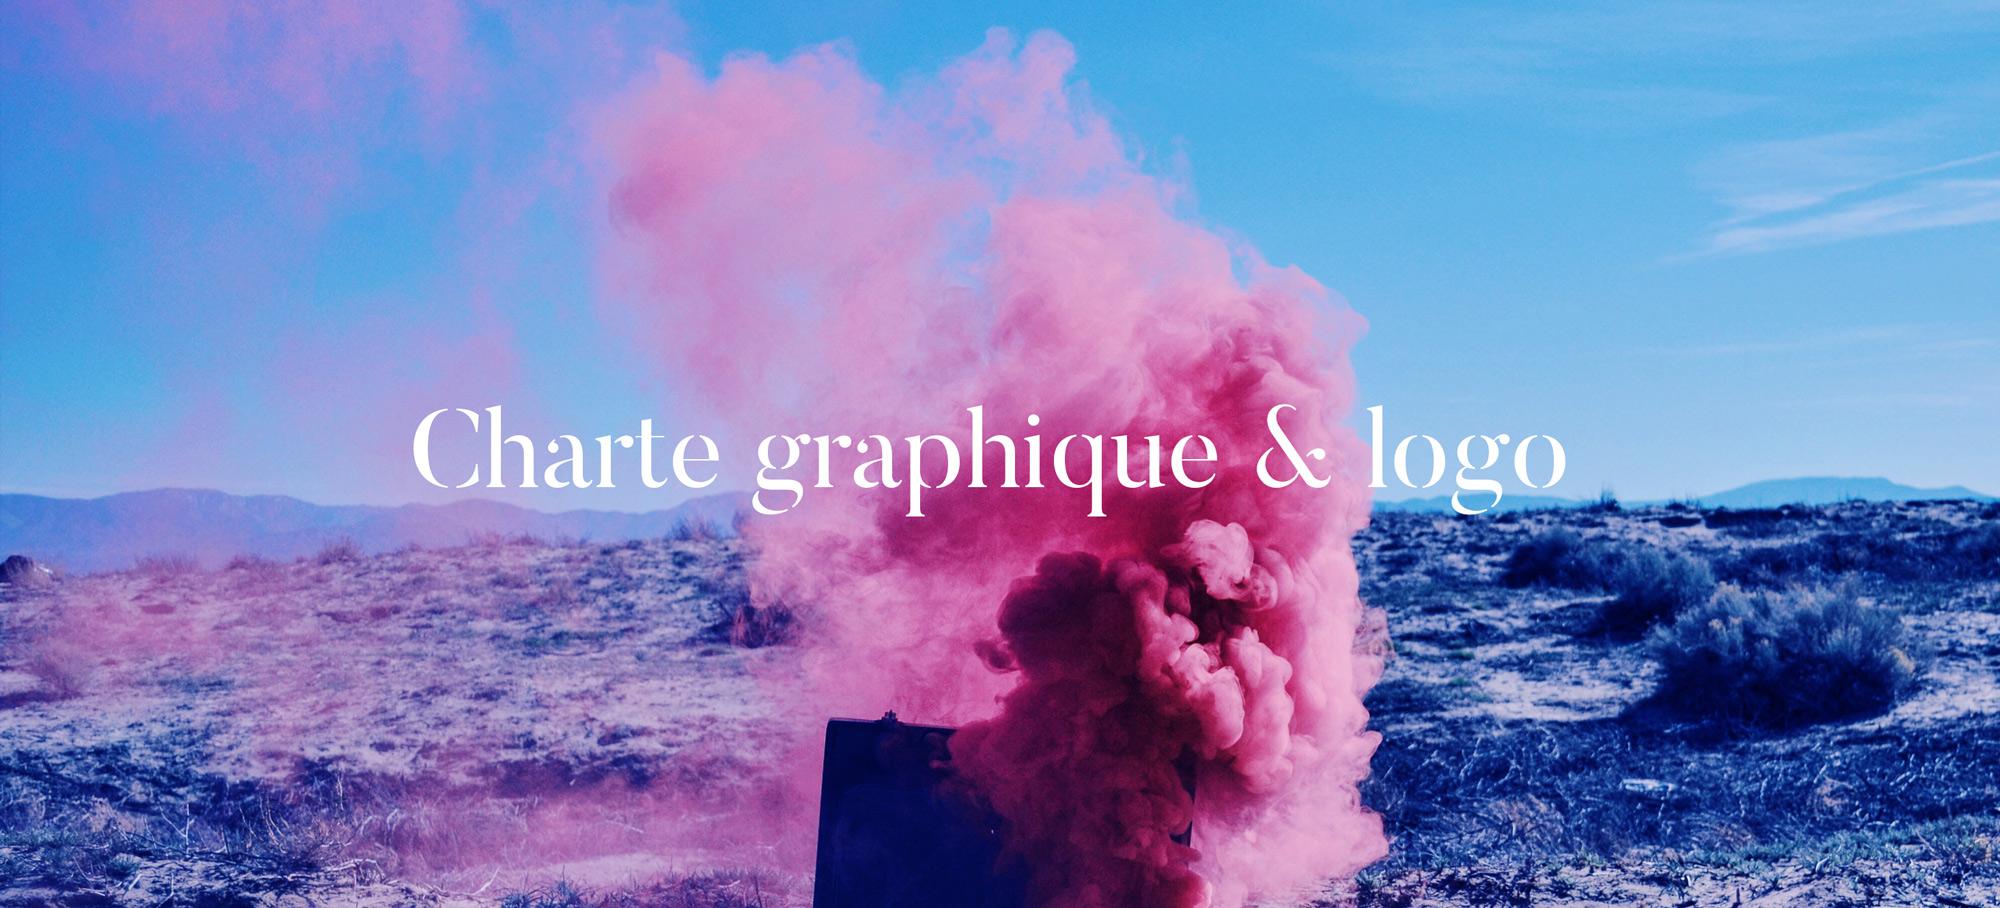 charte-graphique-agence-ysee-valentine-franssen